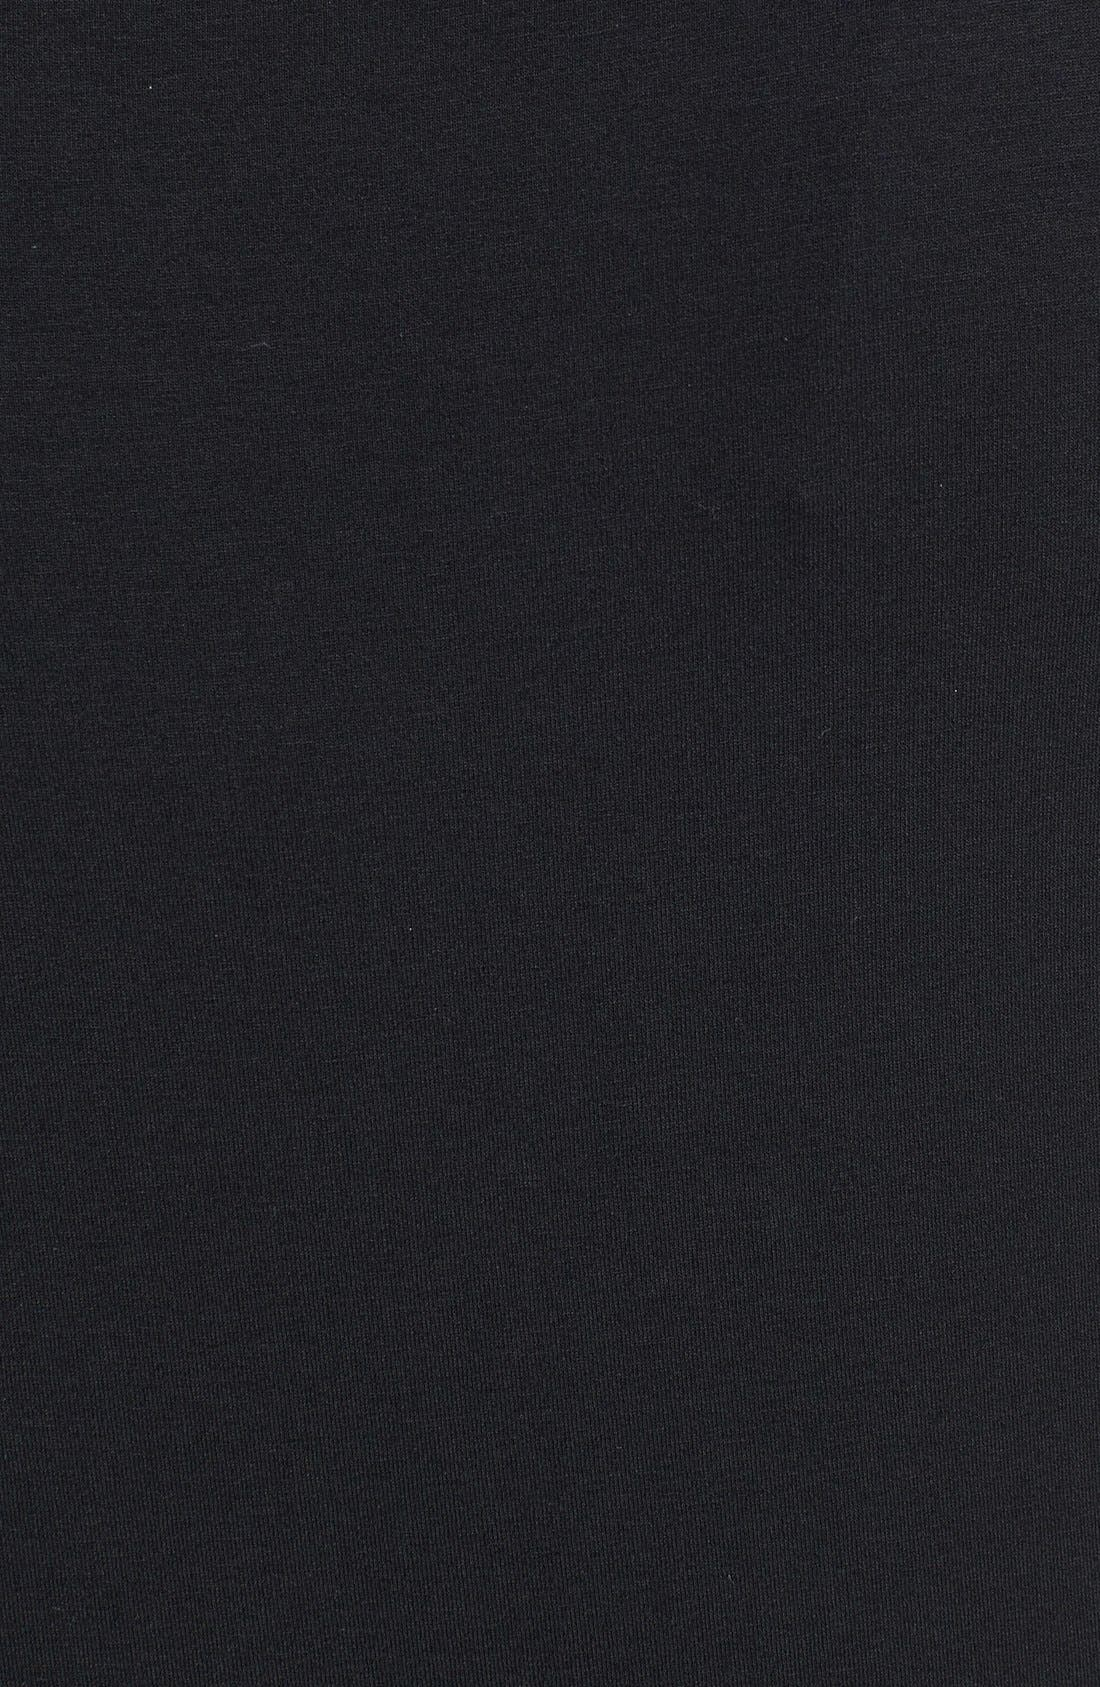 Alternate Image 3  - Eileen Fisher Scoop Neck Jersey Dress (Petite)